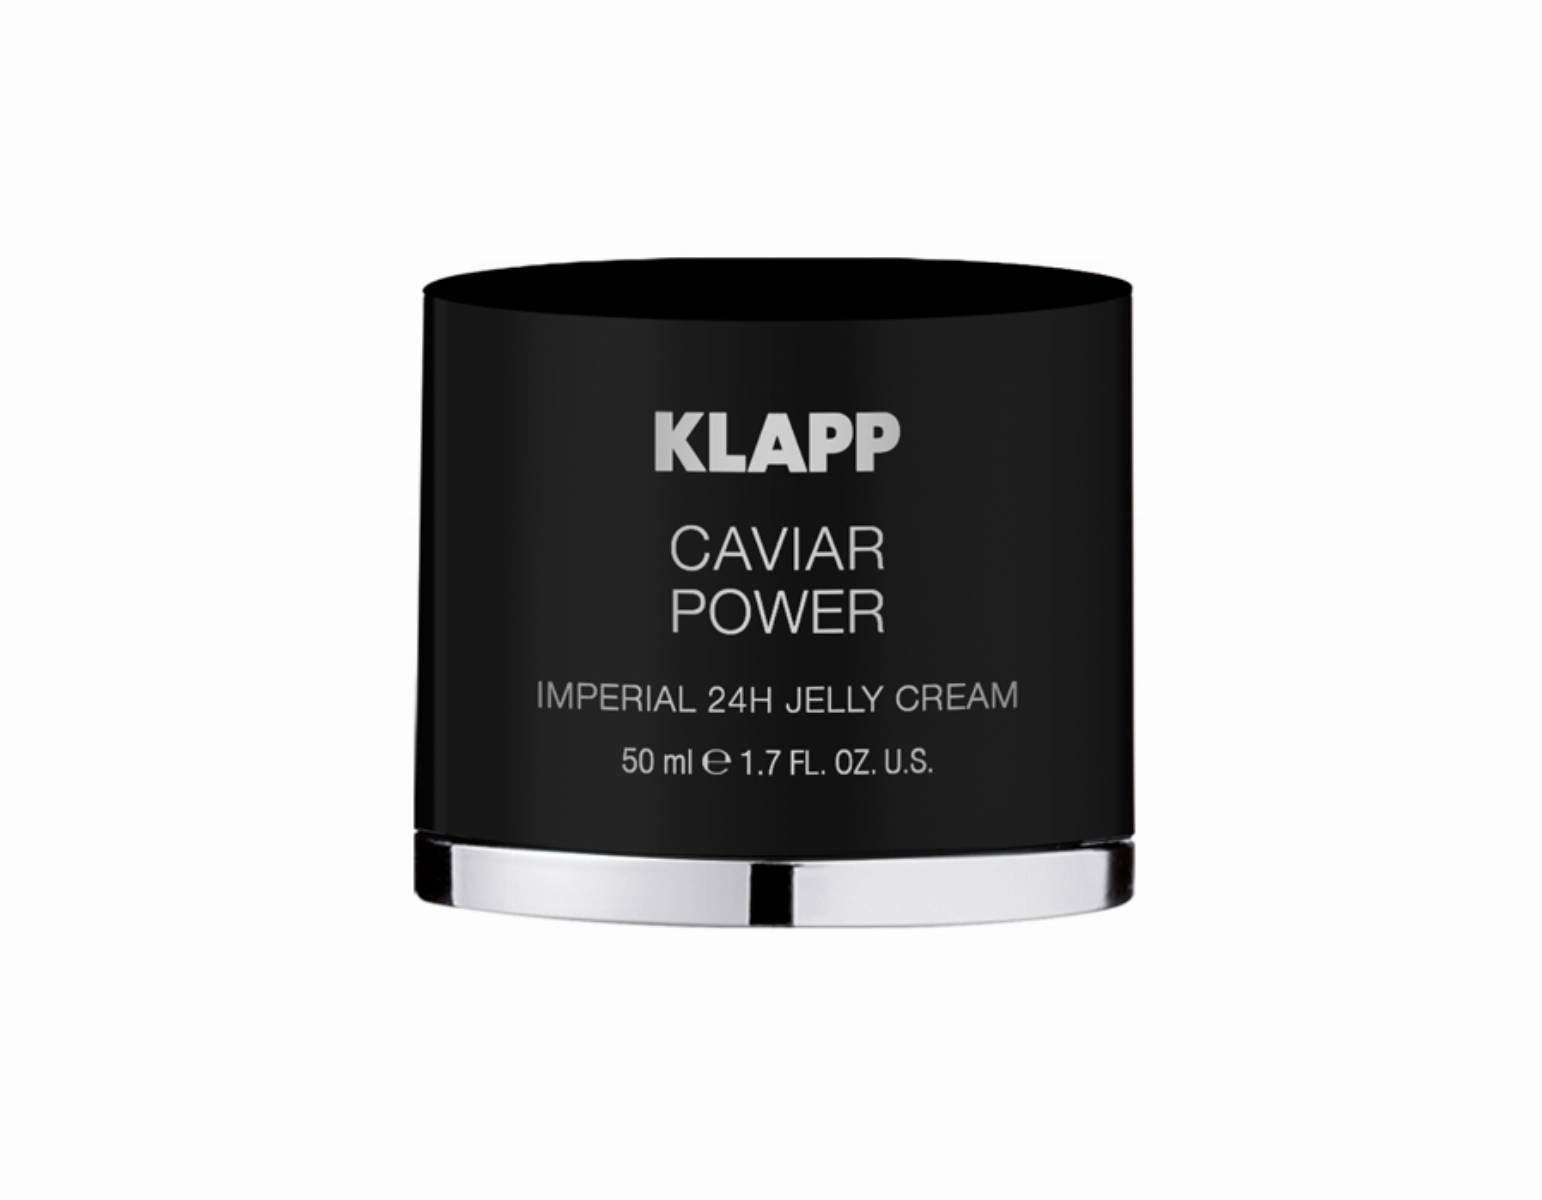 Caviar Power Imperial